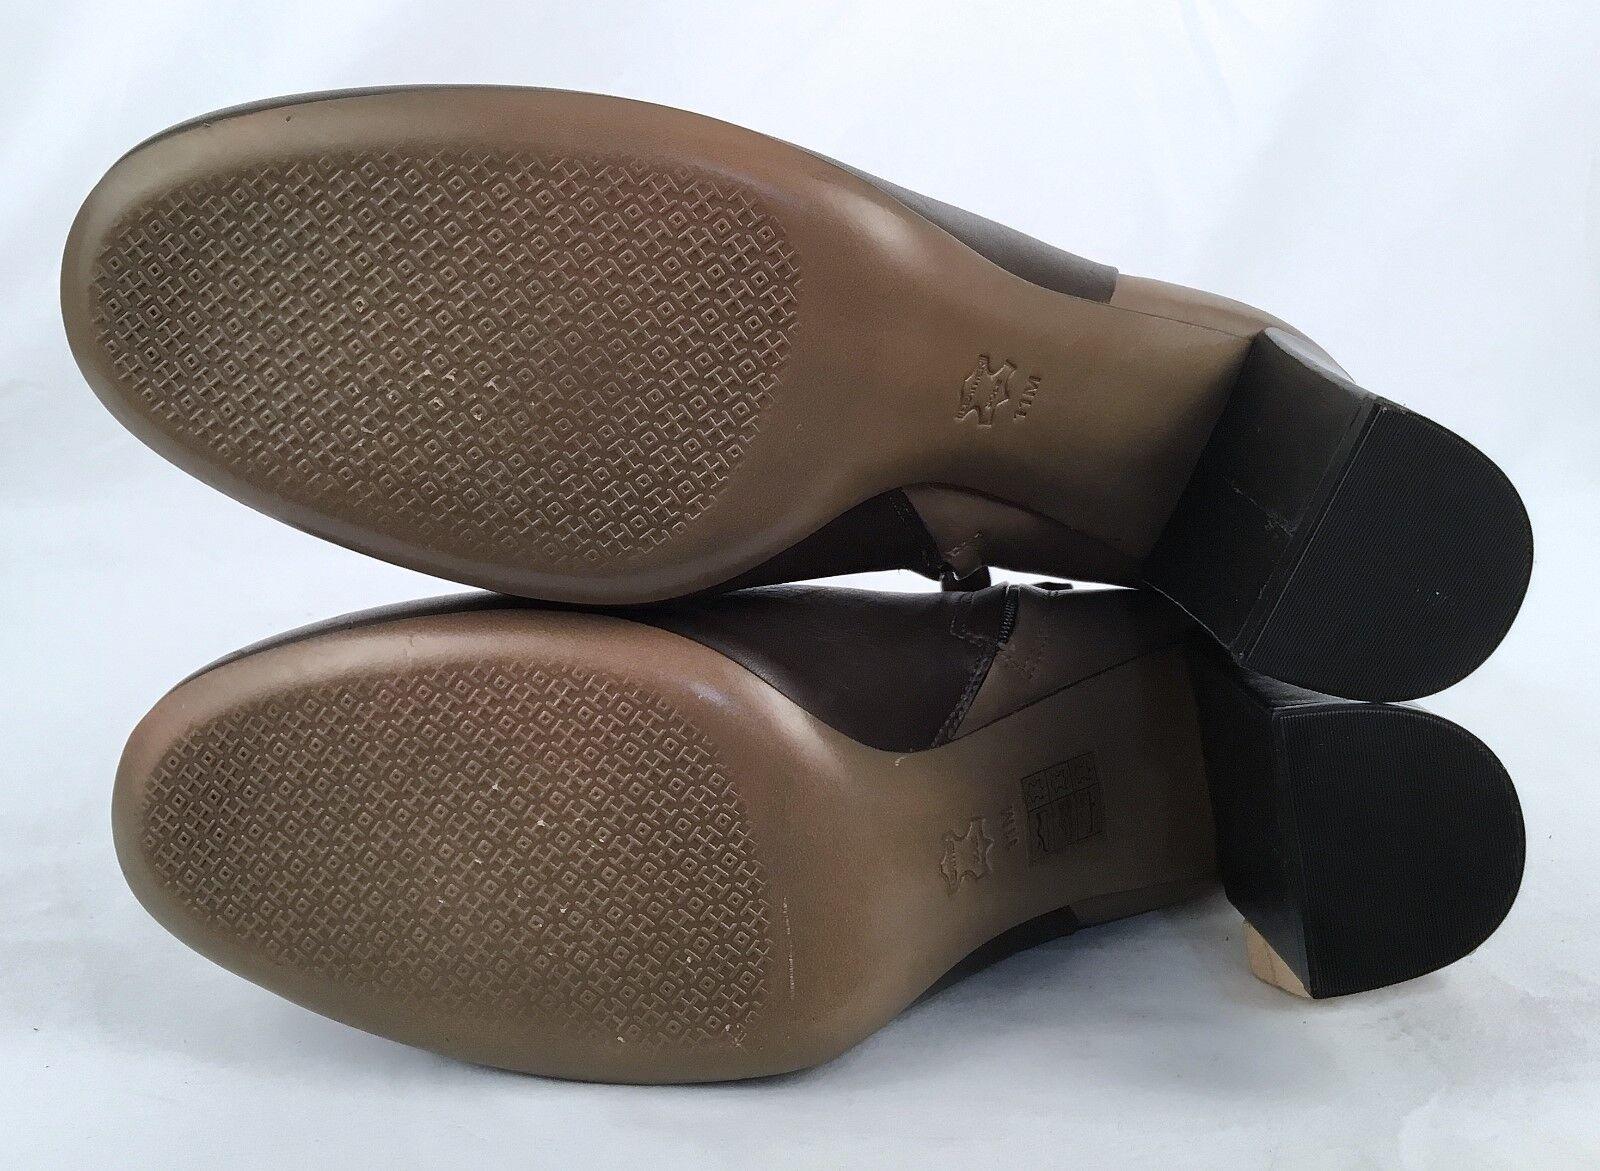 Nuevo    Tory Burch Botines De Cuero Tobillo Tobillo Tobillo de dos tonos-tamaño 11 M -  259 (J7) 6f796c